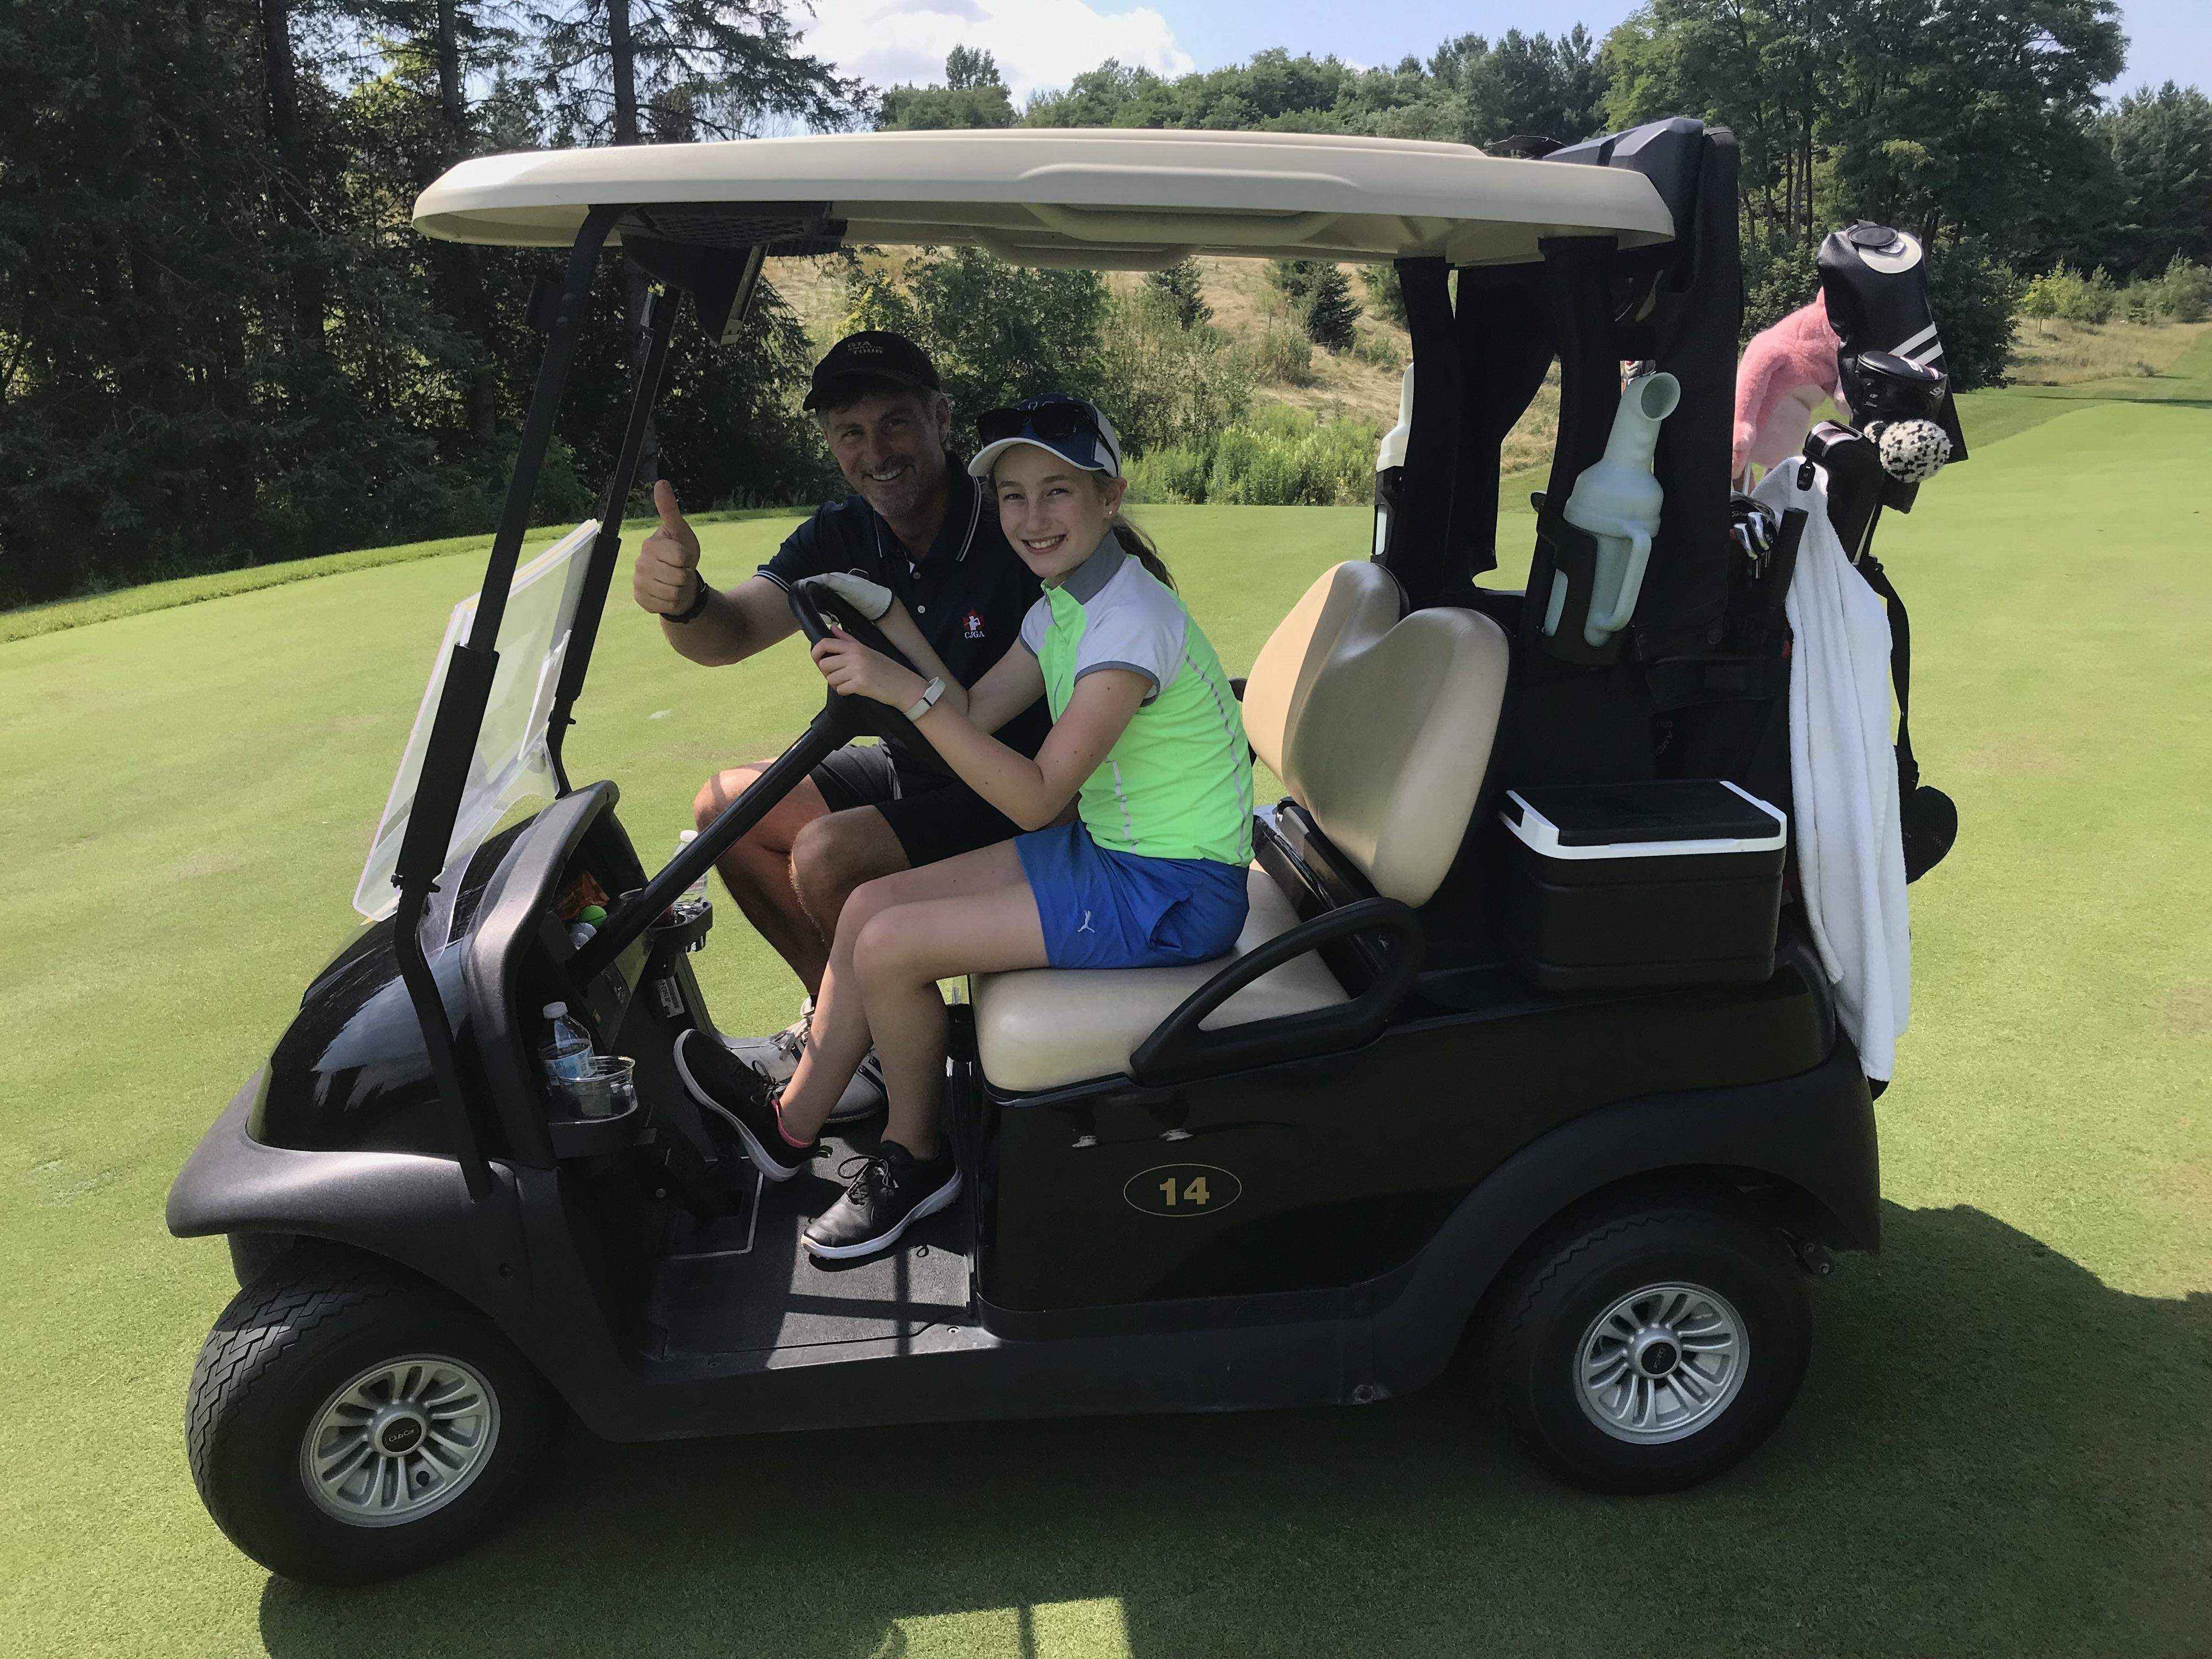 CJGA (Canadian Junior Golf Association) Charity Golf Tournament on Sept 17 gallery image #15